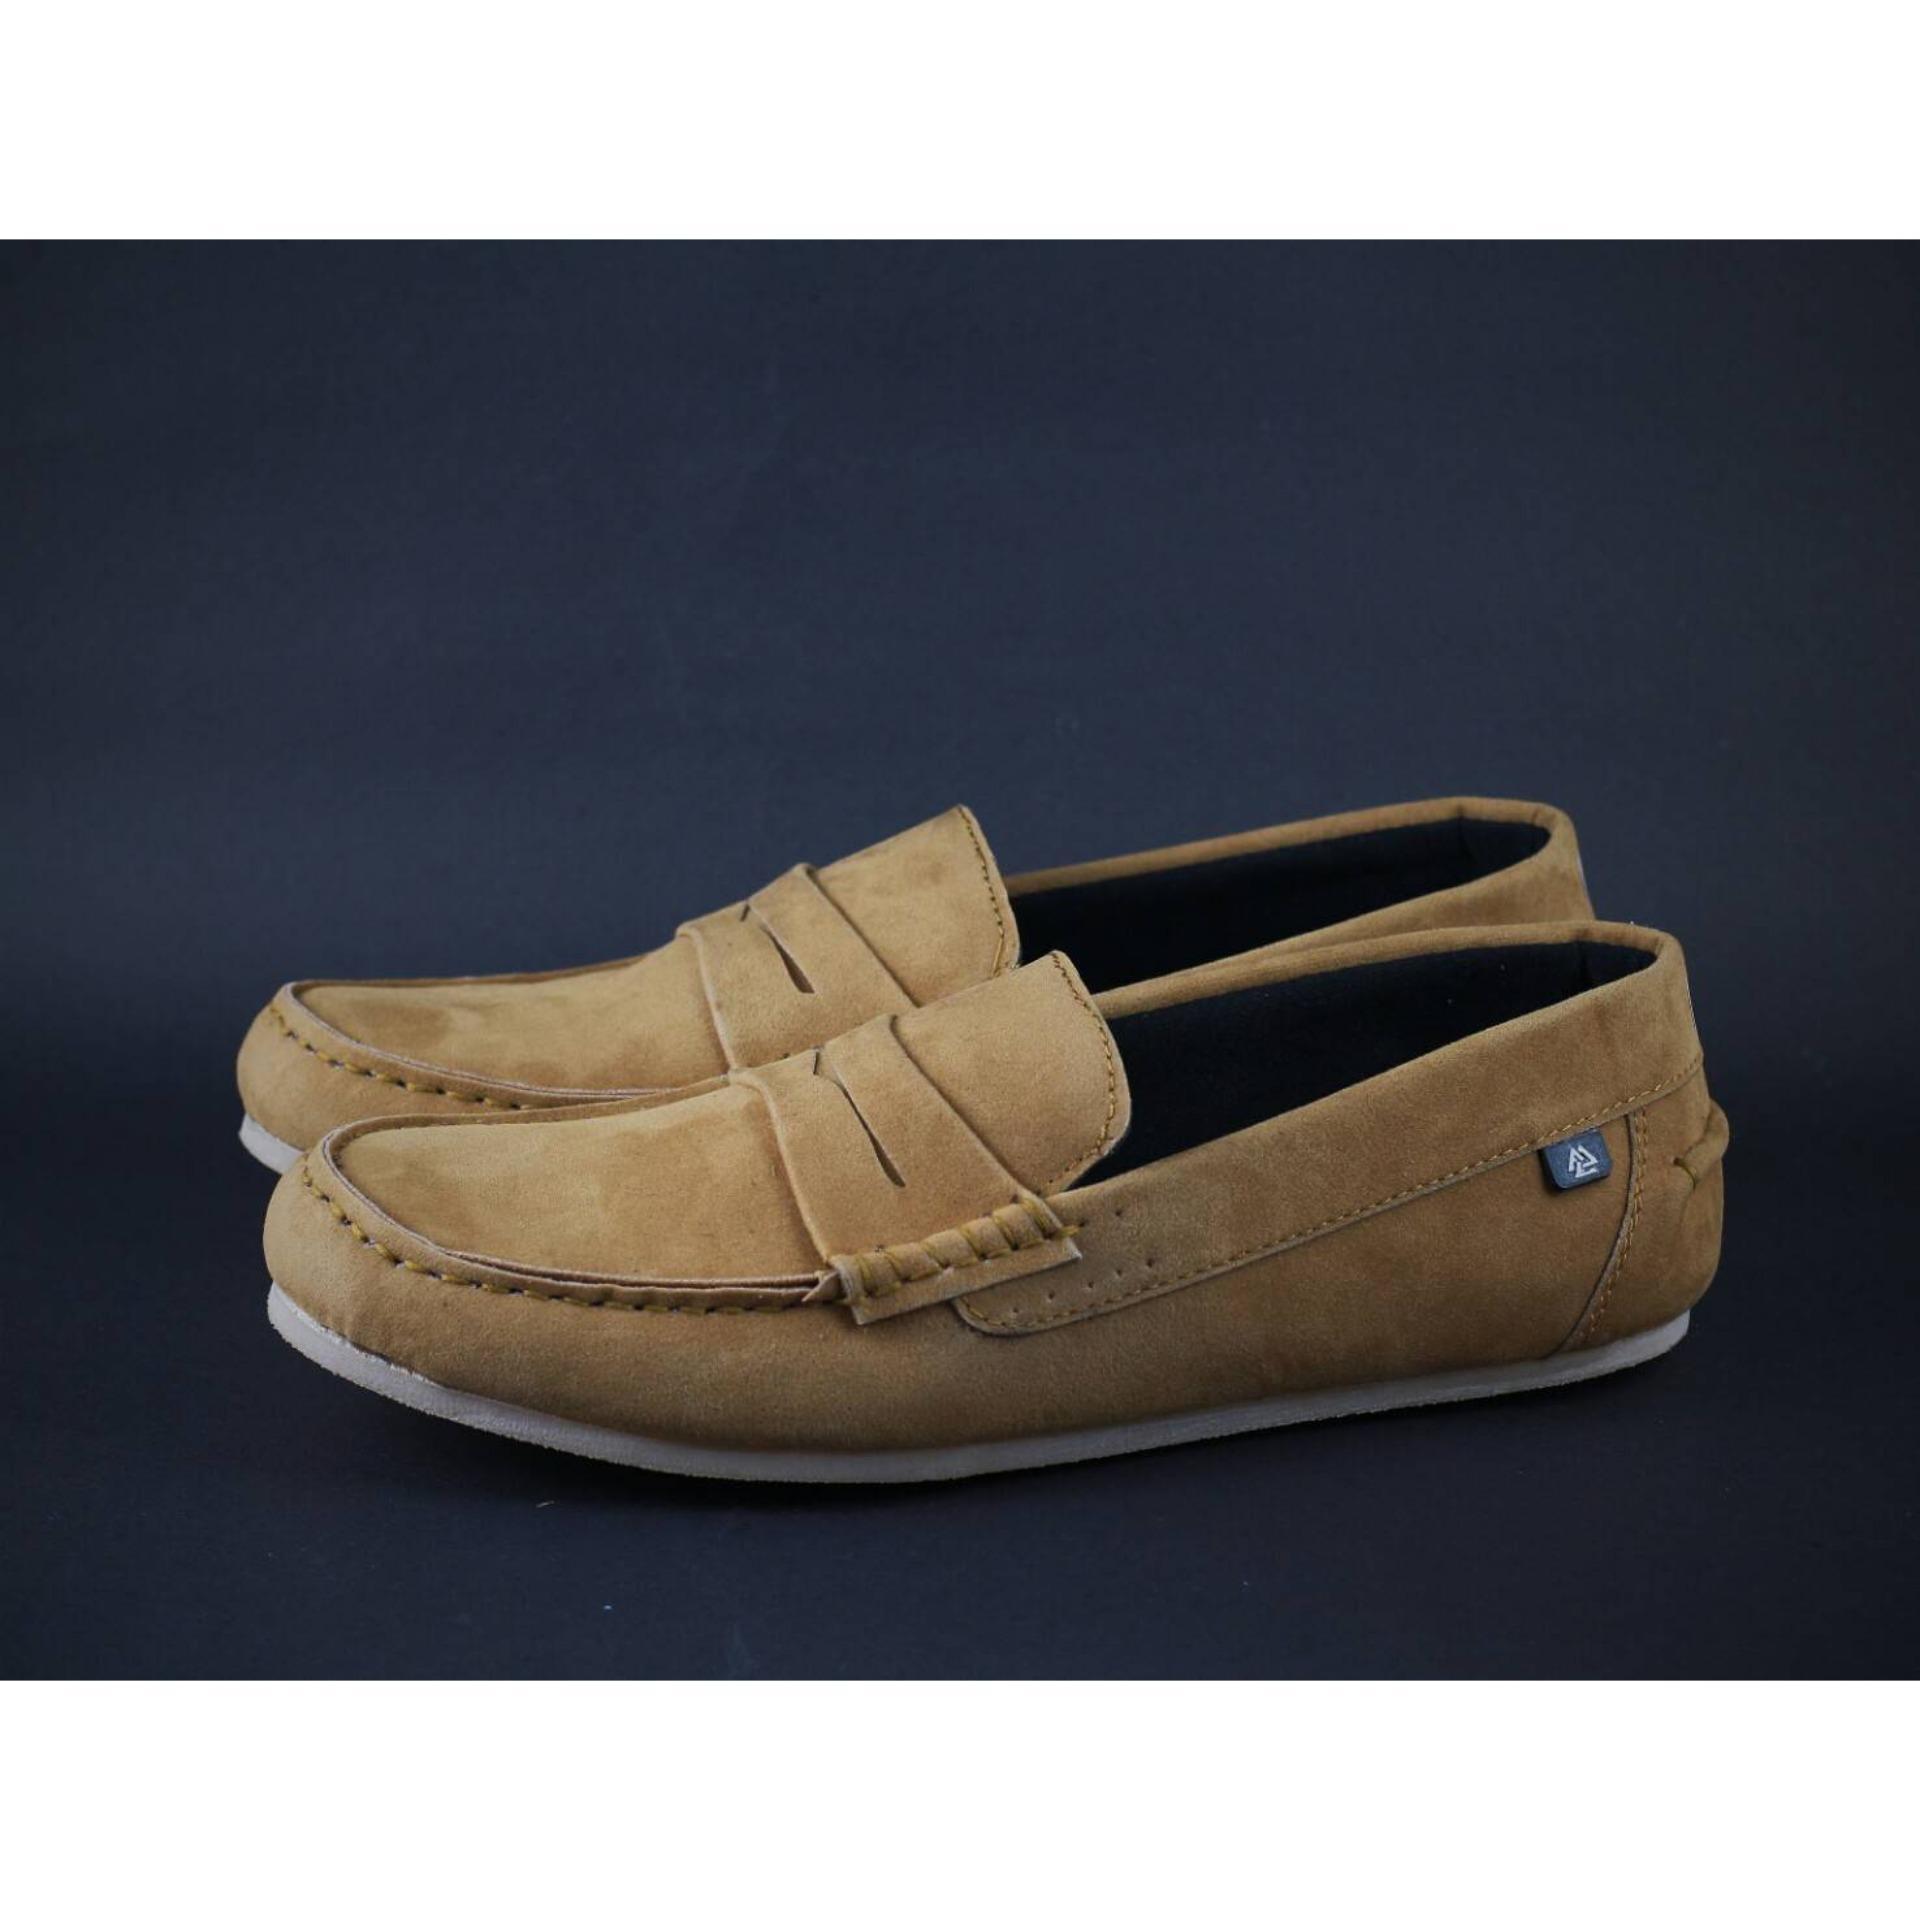 Cek Harga Baru Sepatu Casual Slip On Pria Reyl Sepatu Santai Pria ... 82445da625